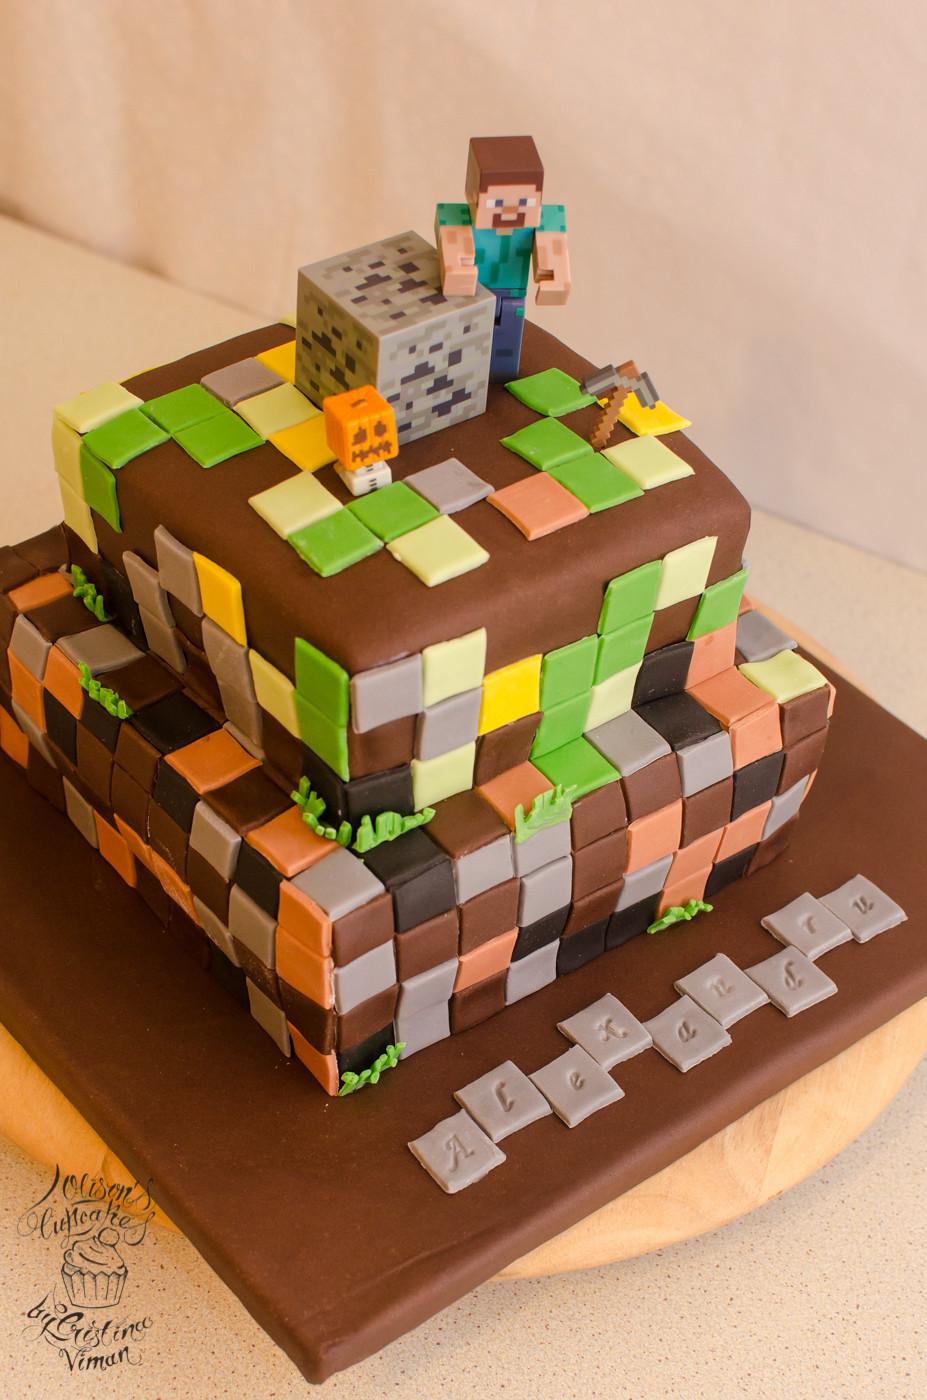 How To Make A Minecraft Birthday Cake  Minecraft Birthday Cake – Olison s Cupcakes